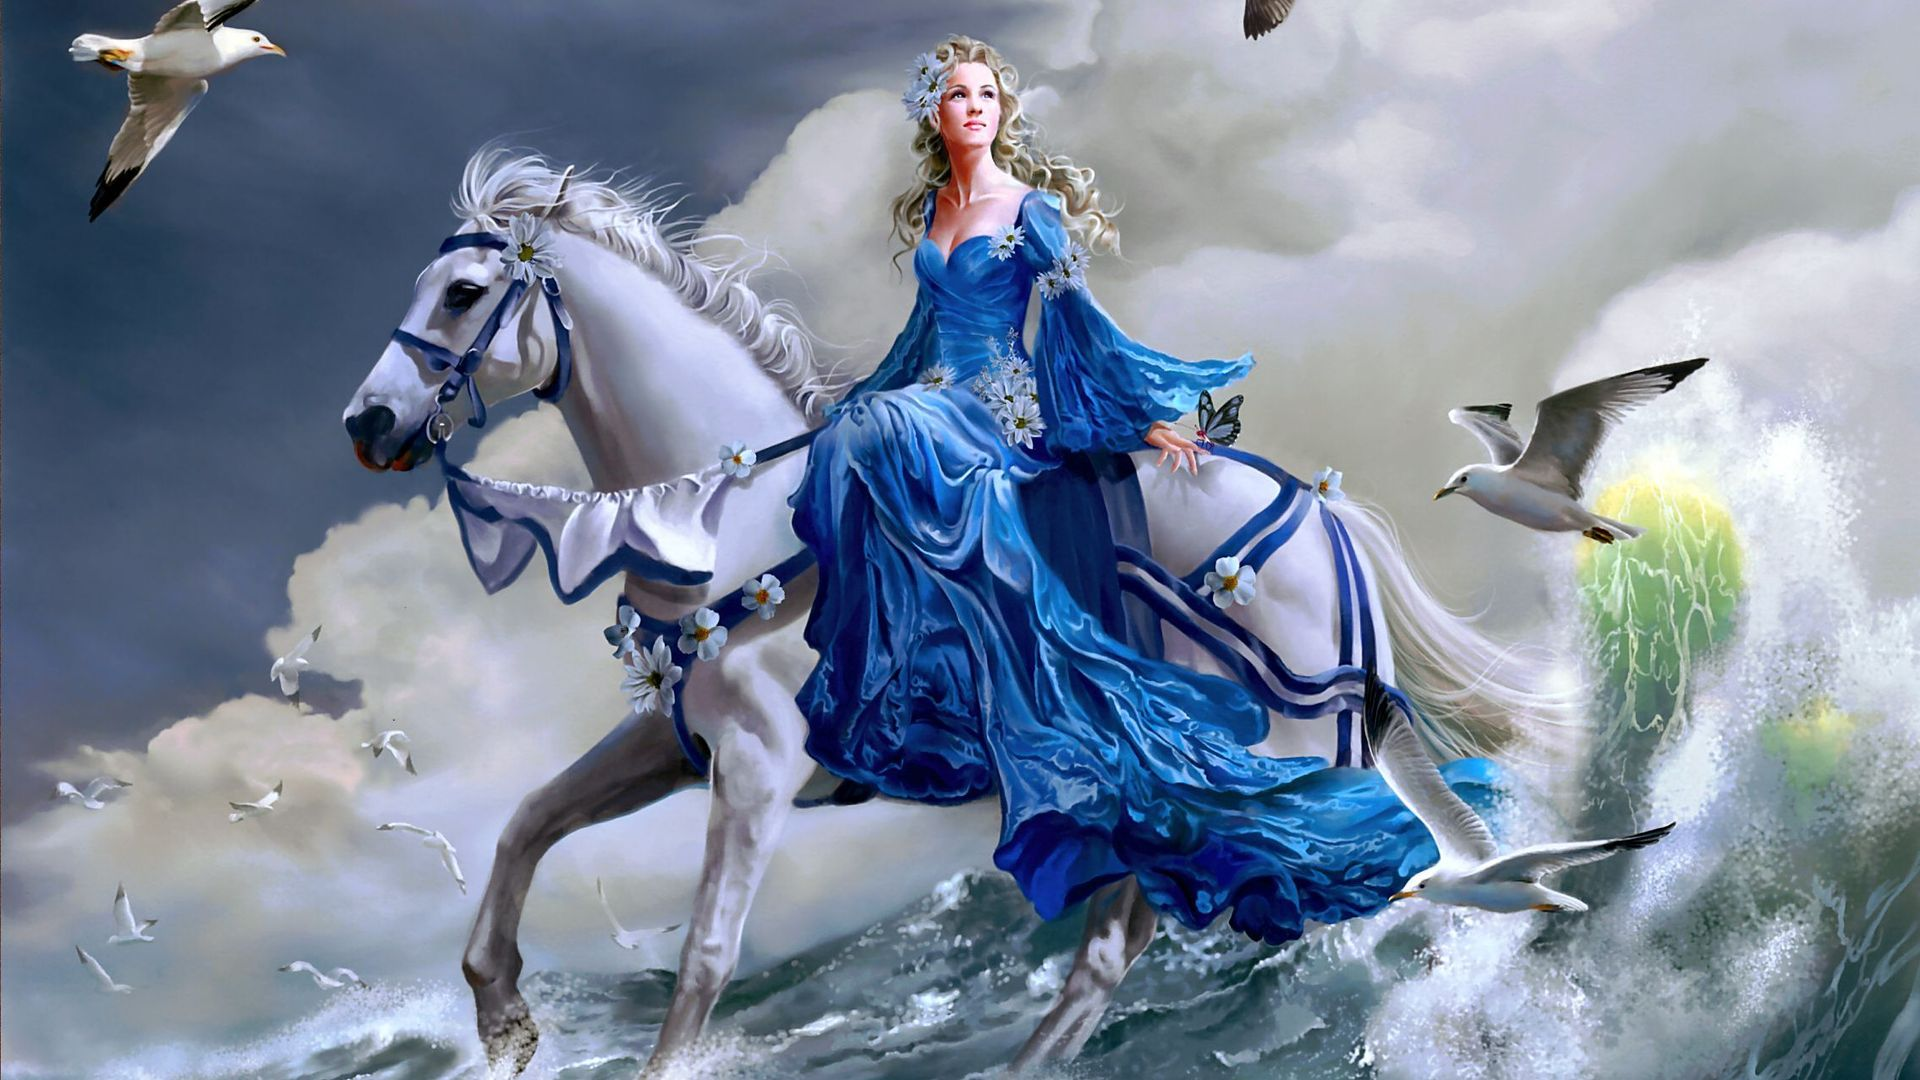 3d fantasy art wallpapers women wallpapersafari for Exclusive 3d wallpaper